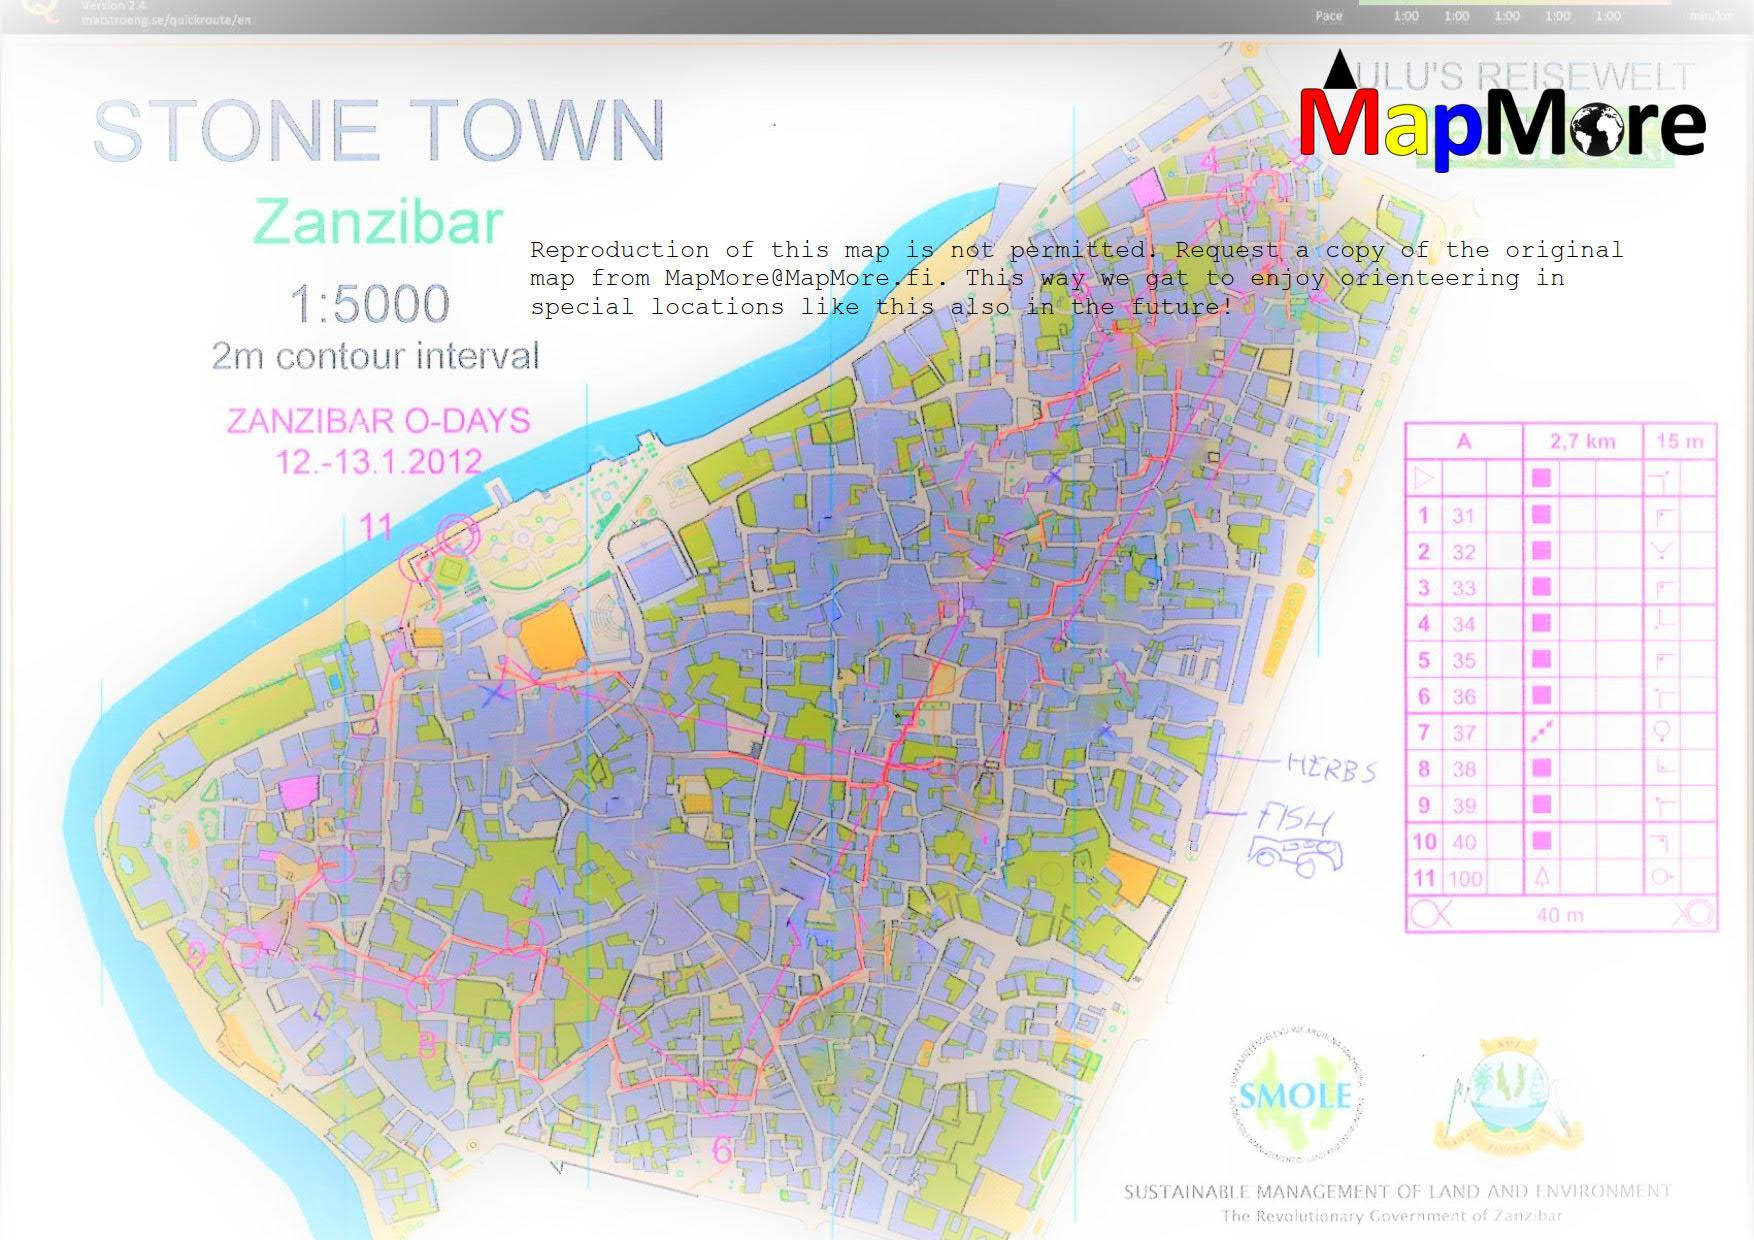 Zanzibar orienteering map